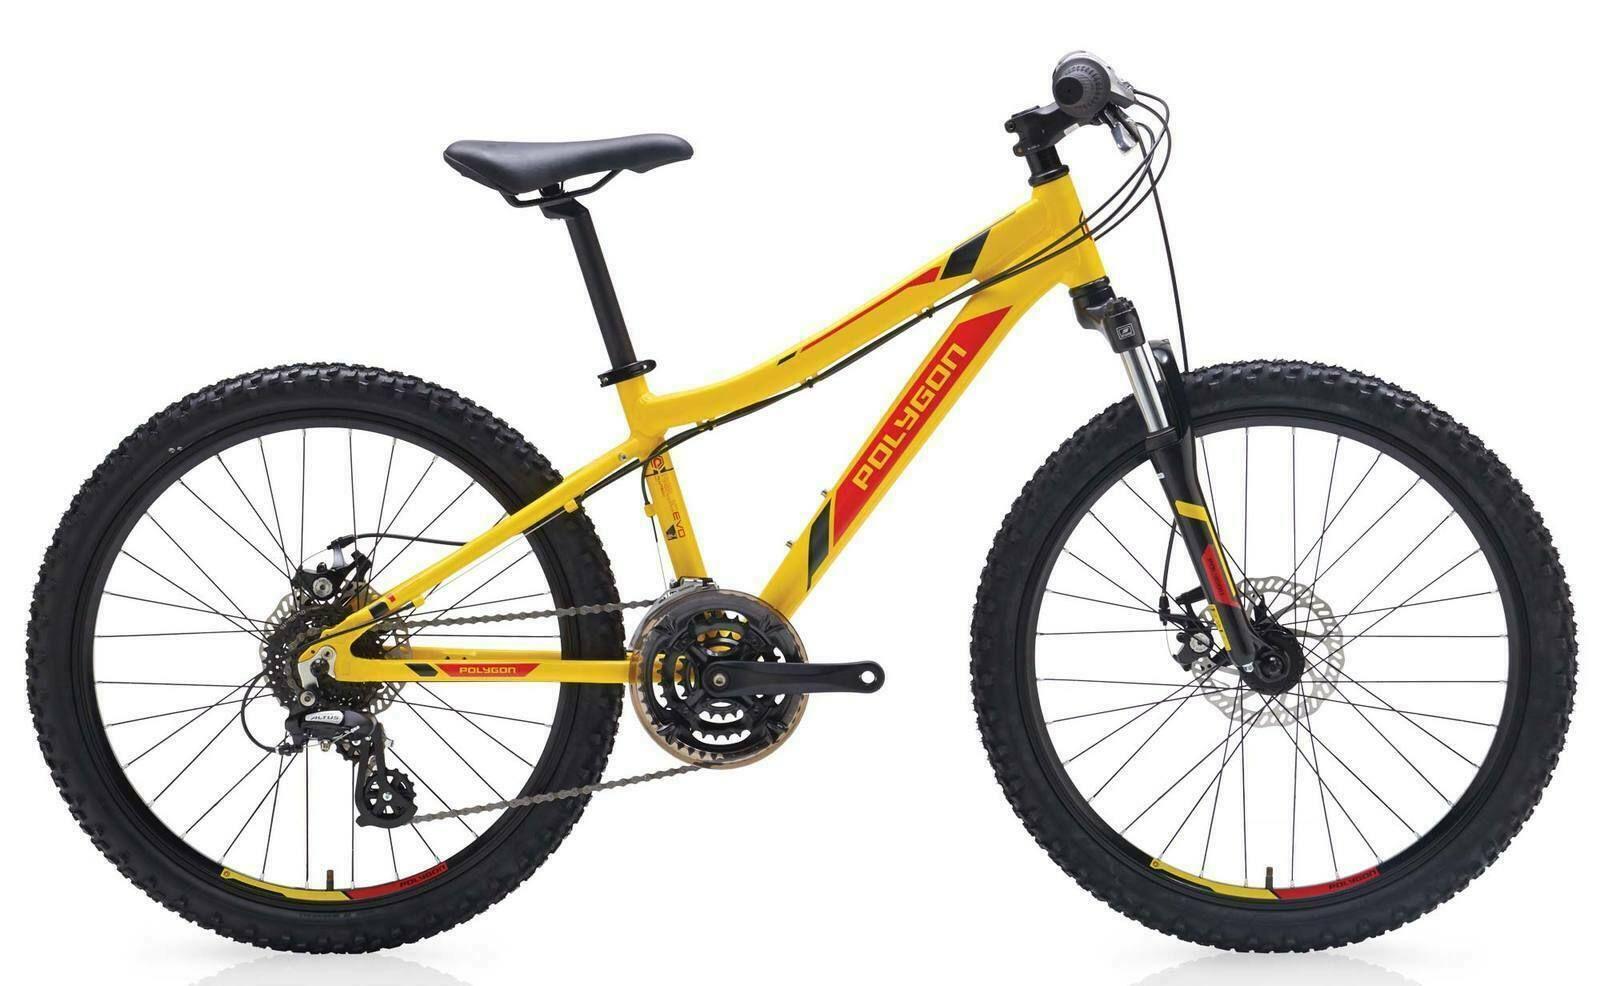 Polygon Relic 24 Evo Kids Mountain Bike 24 Inch Wheels Mountain